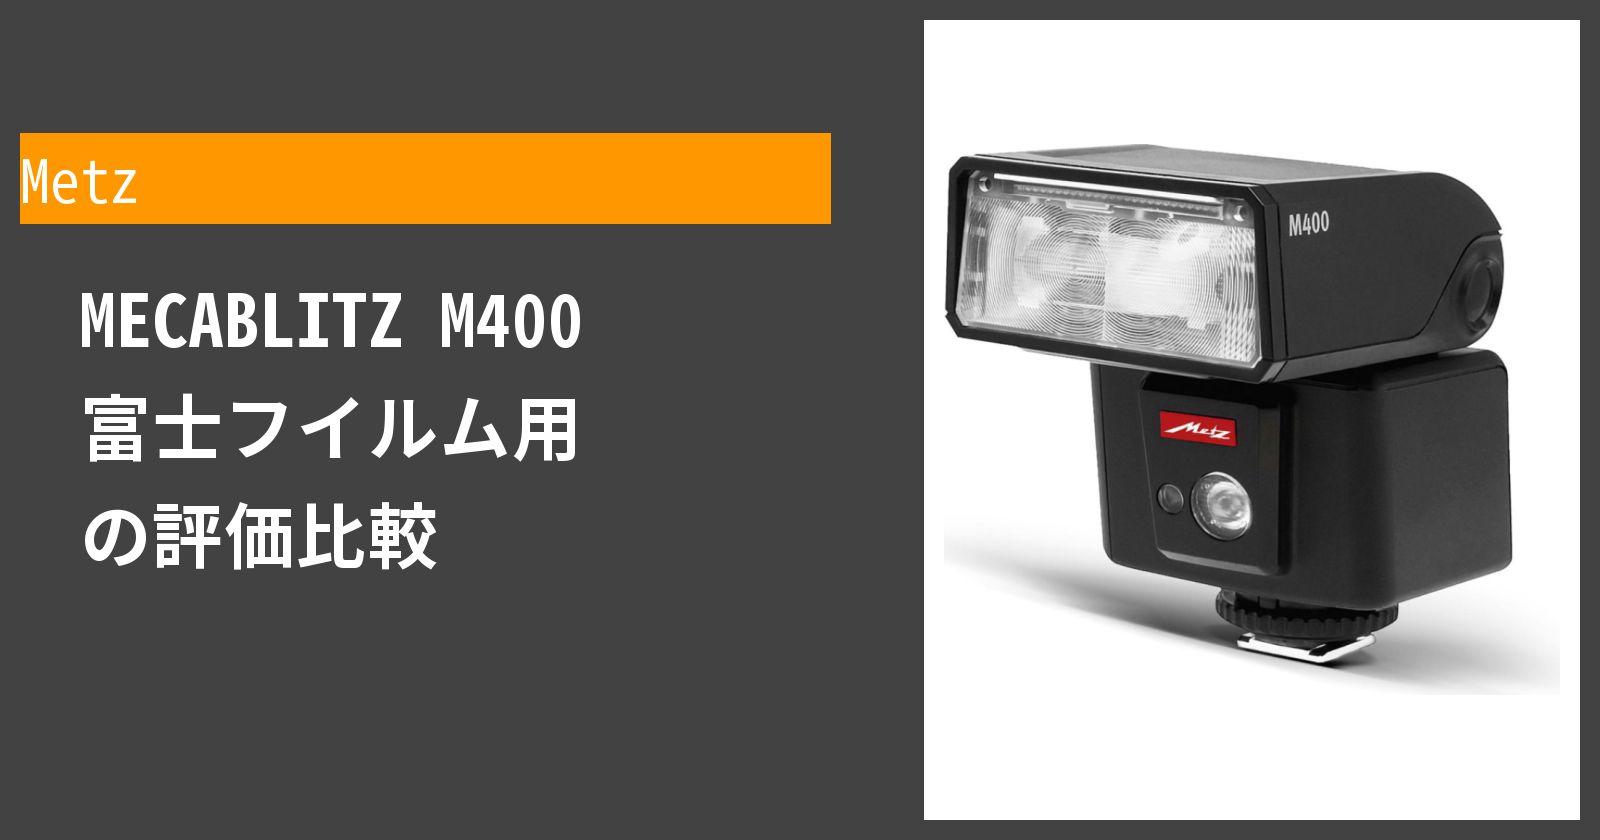 MECABLITZ M400 富士フイルム用を徹底評価